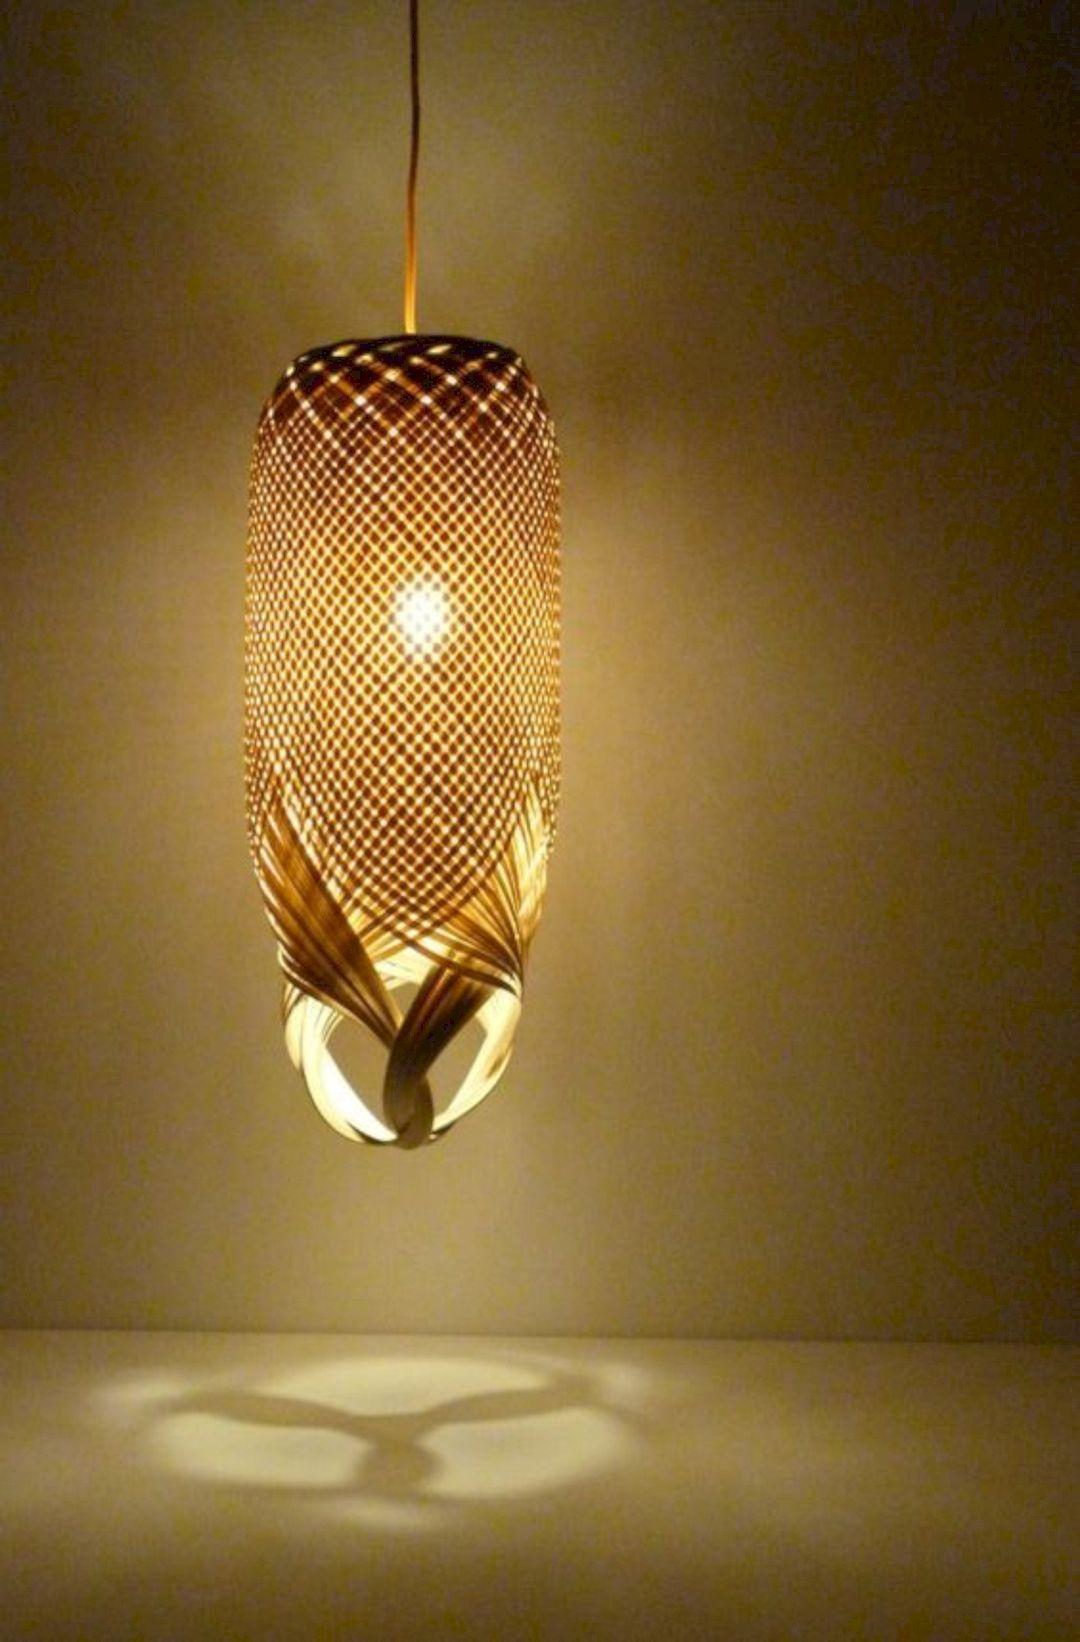 15 Amazing Bamboo Lamp Designs | Natural interior, Design design ... for Bamboo Lamp Designs  155sfw